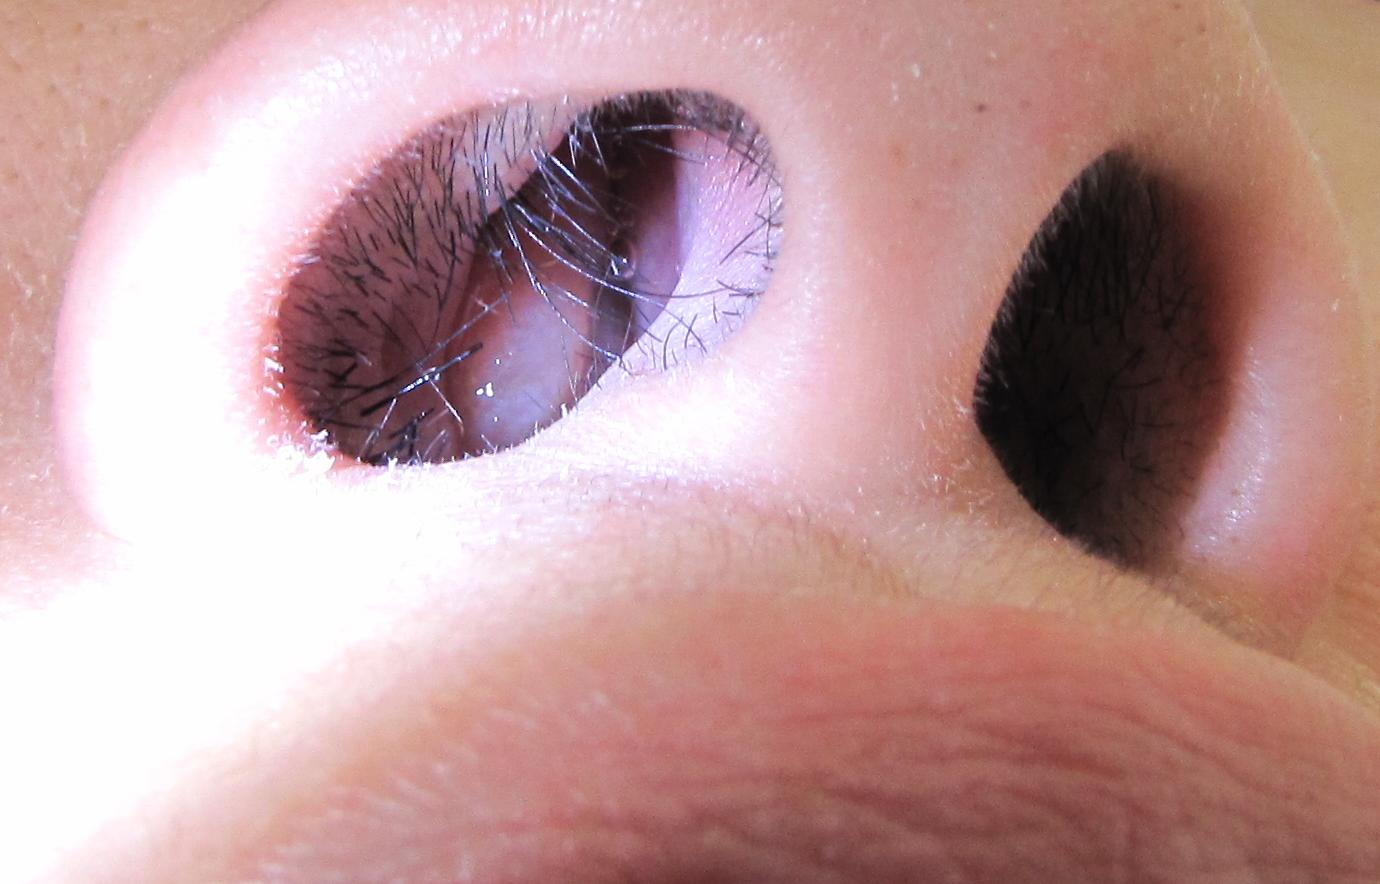 papilloma in nostril